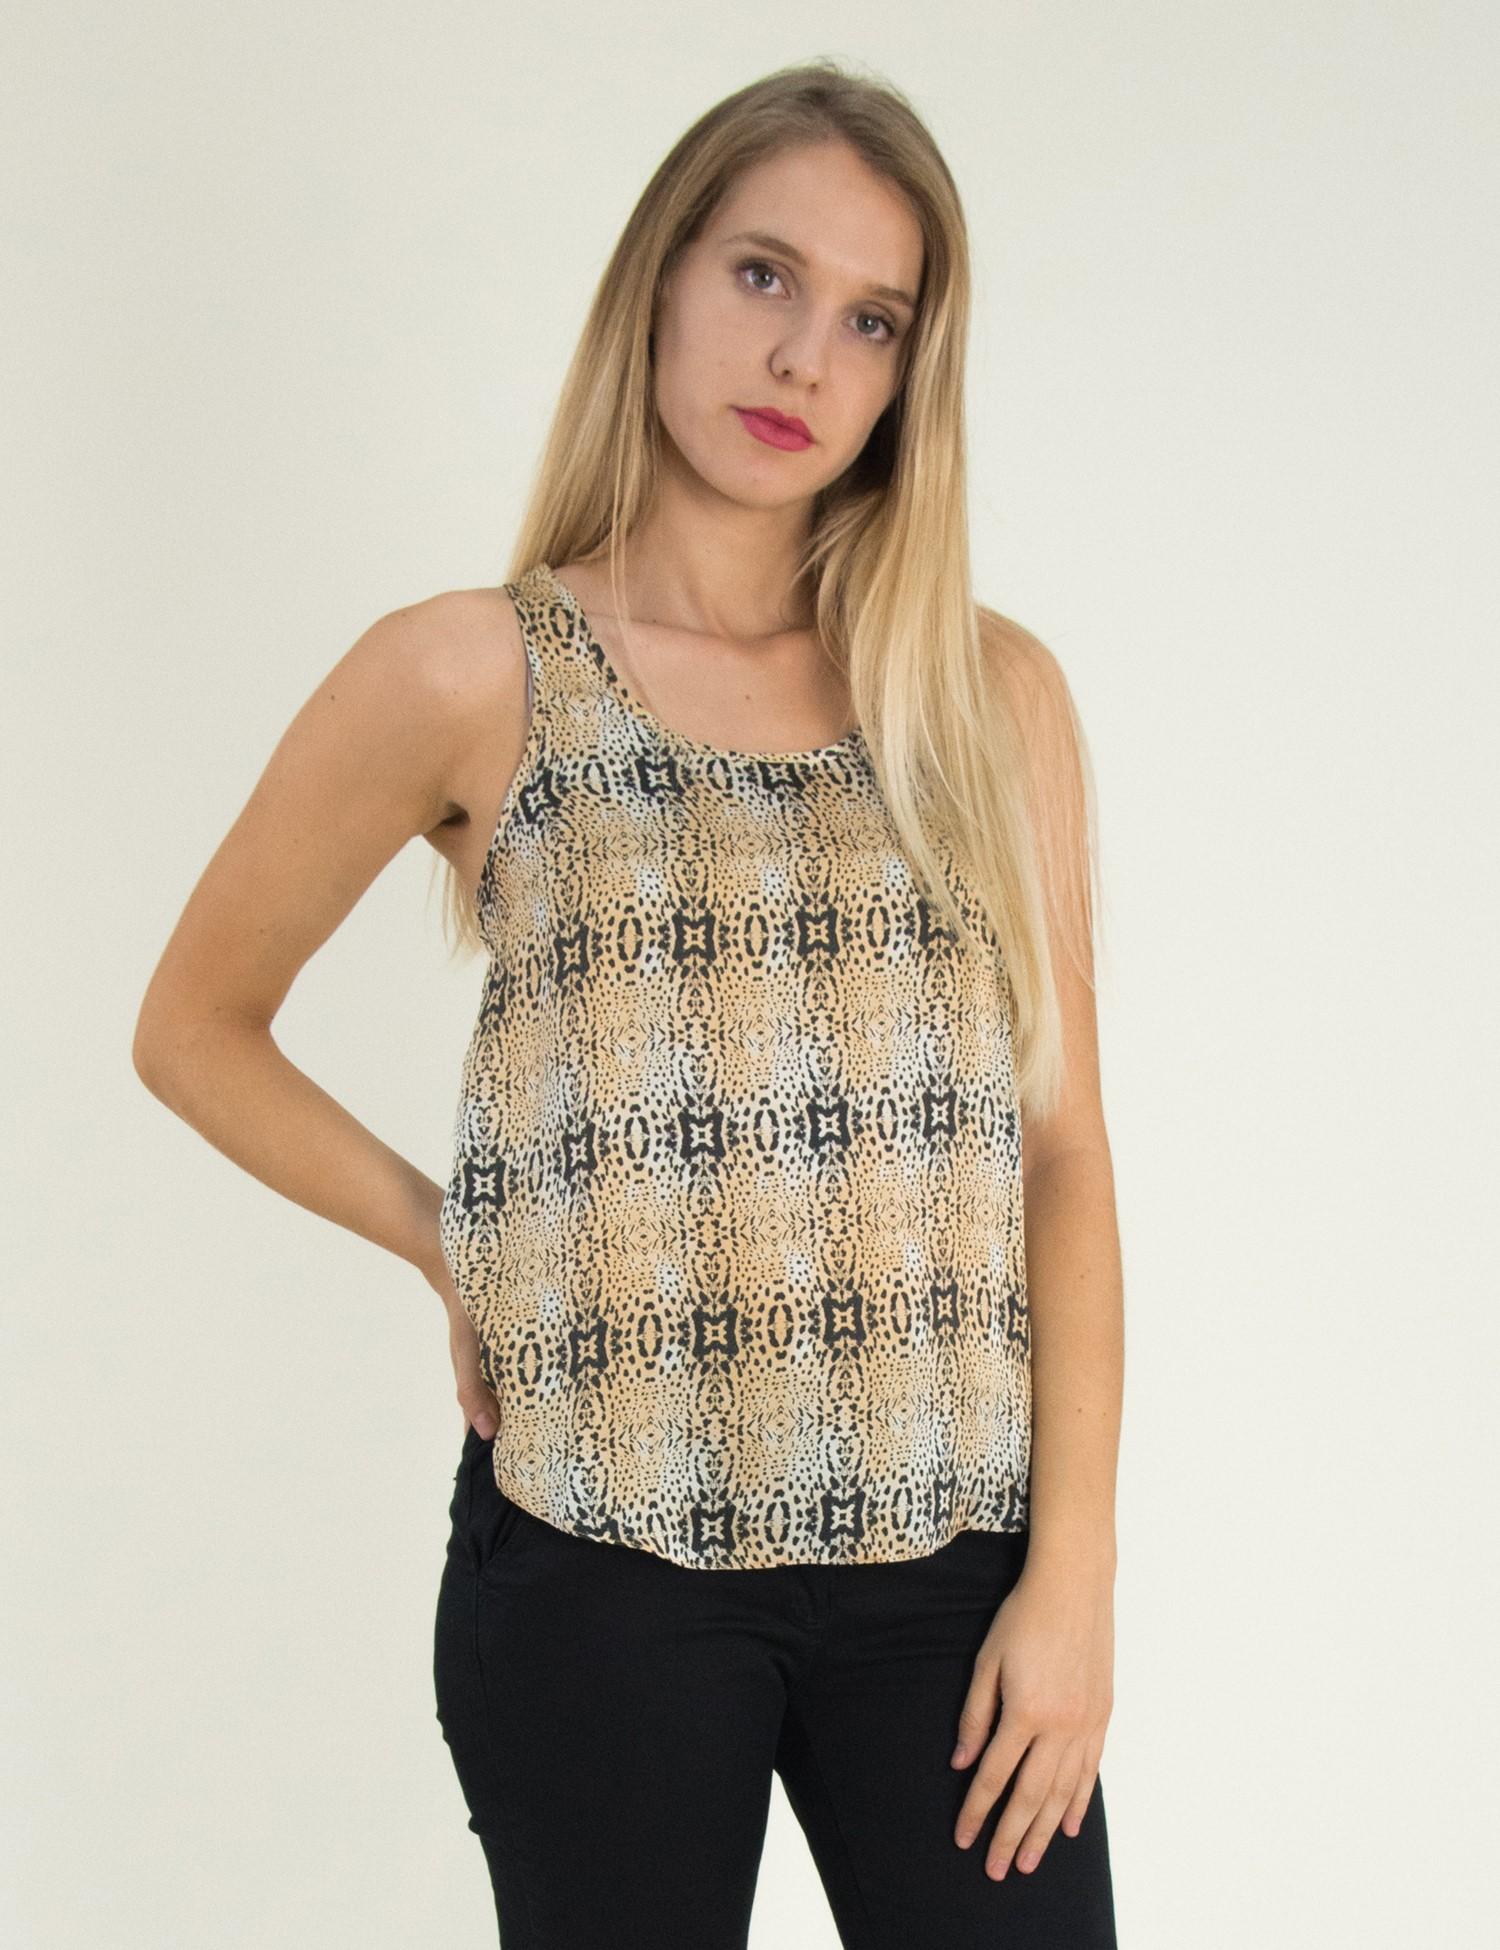 c758ffb60758 Γυναικεία αμάνικη μπλούζα με animal print 162101